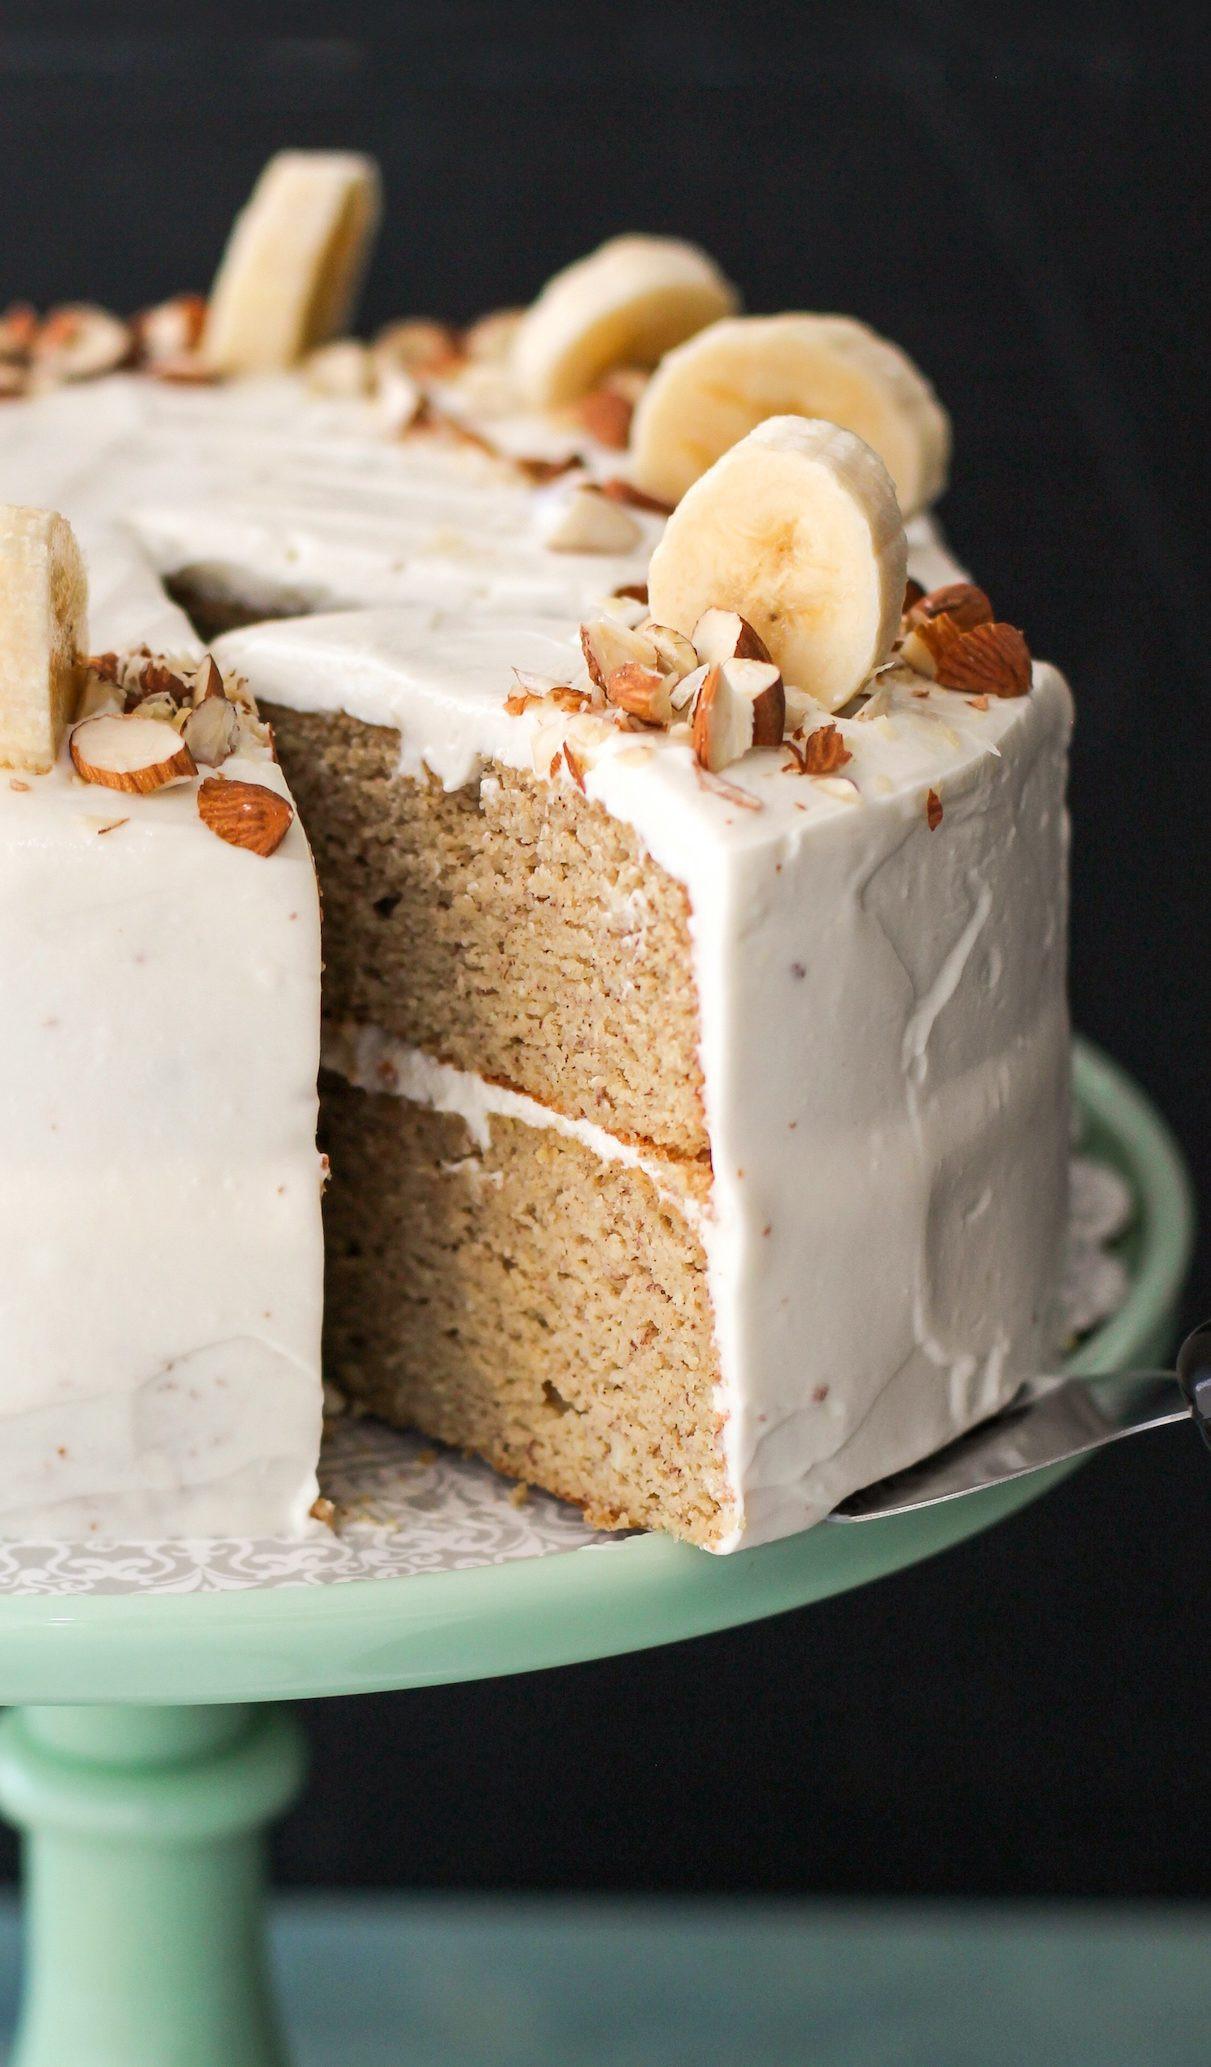 Healthy Banana Dessert  Gluten Free Healthy Banana Cake with Cream Cheese Frosting